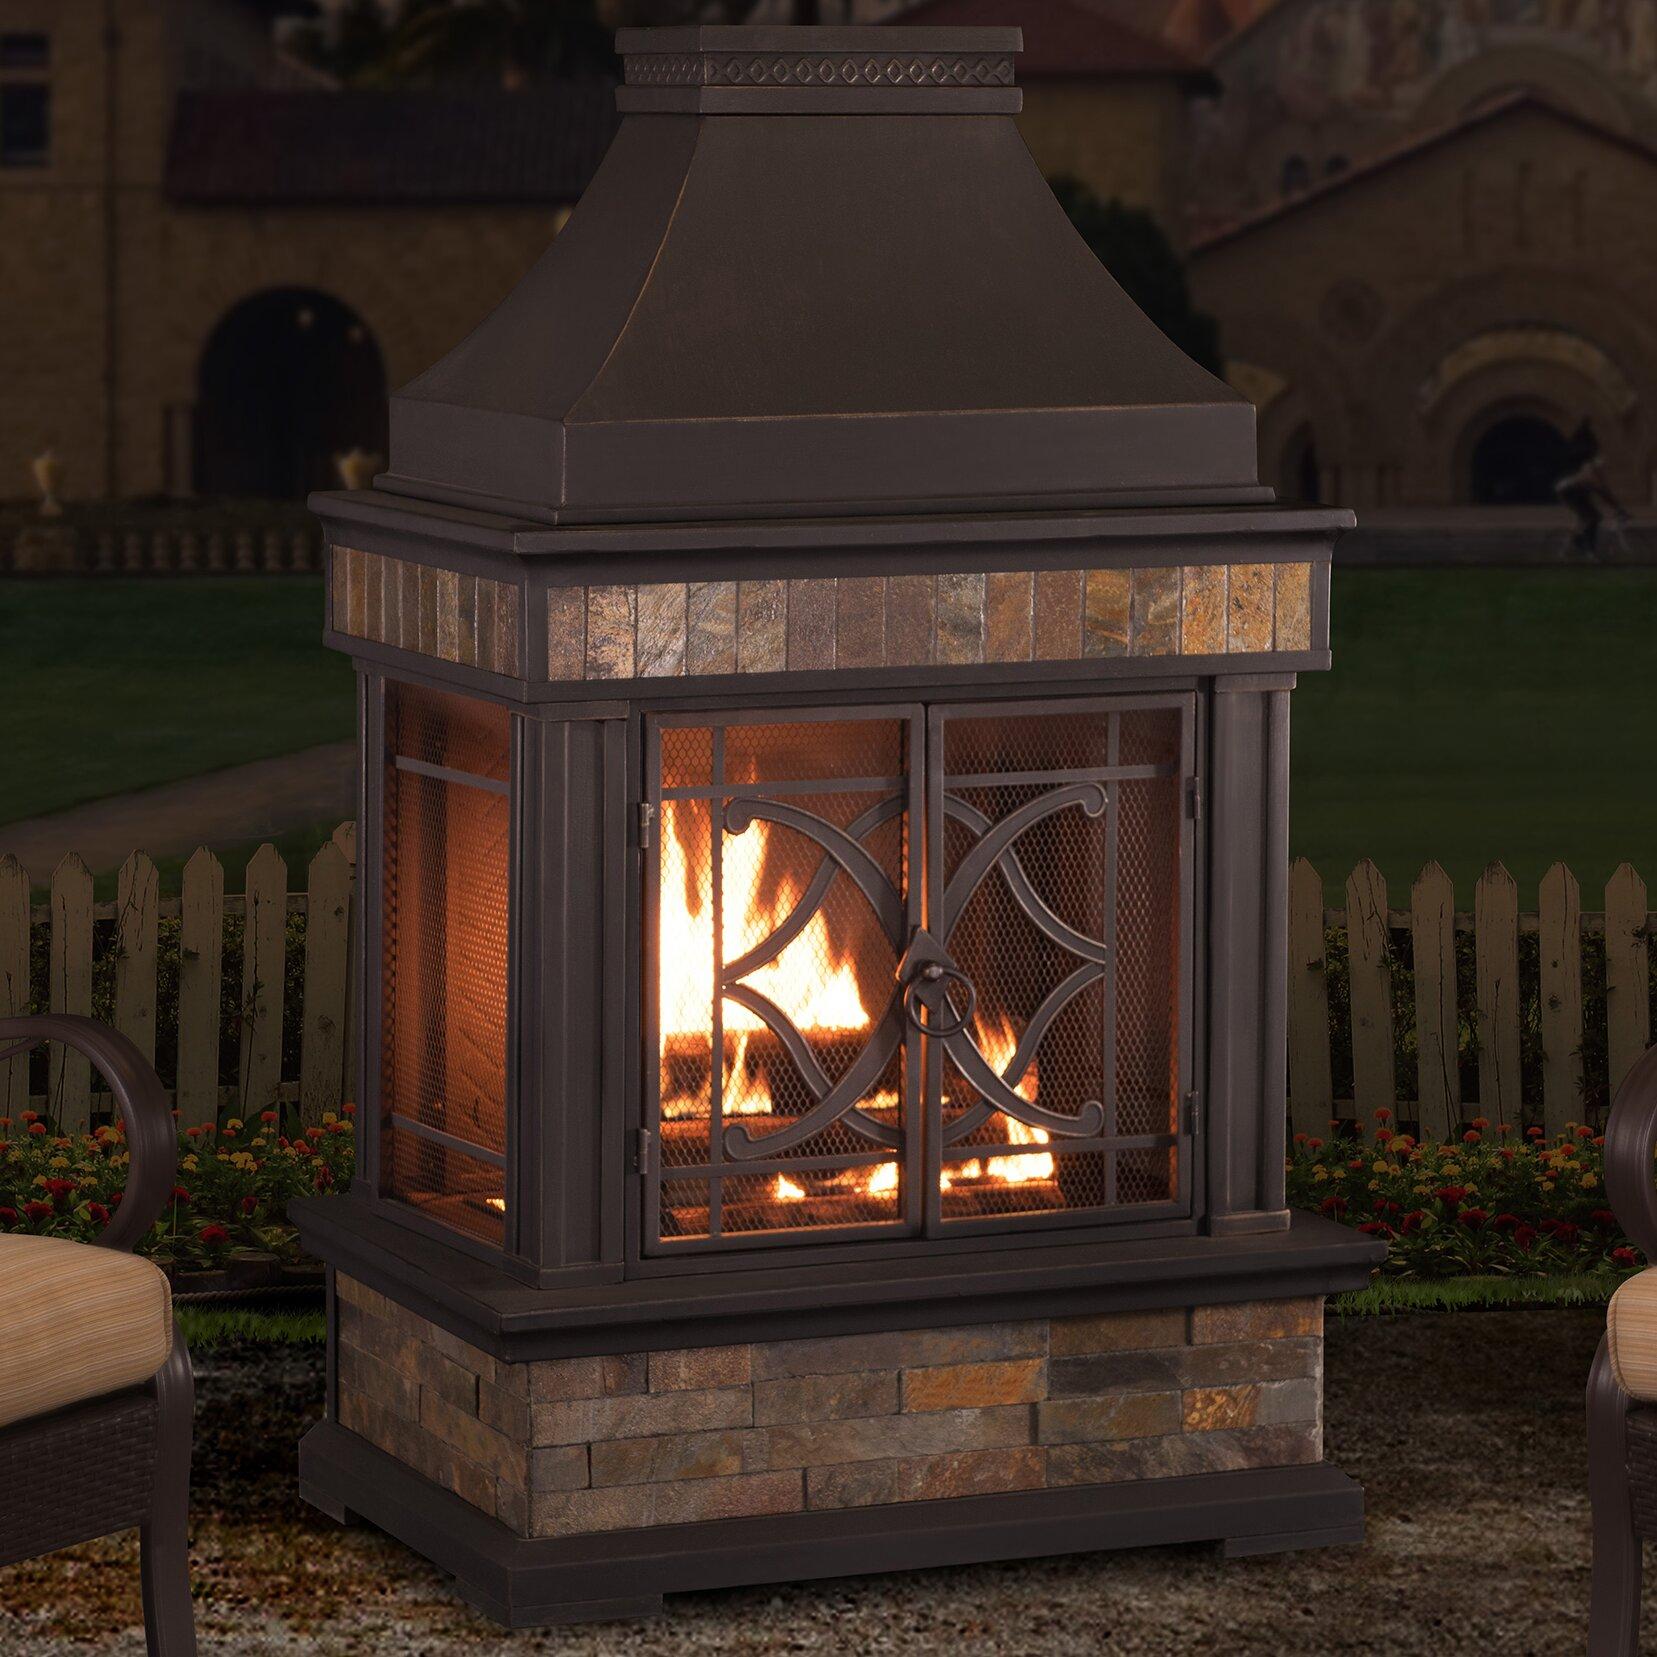 outdoor fireplace propane u2013 fireplace ideas gallery blog